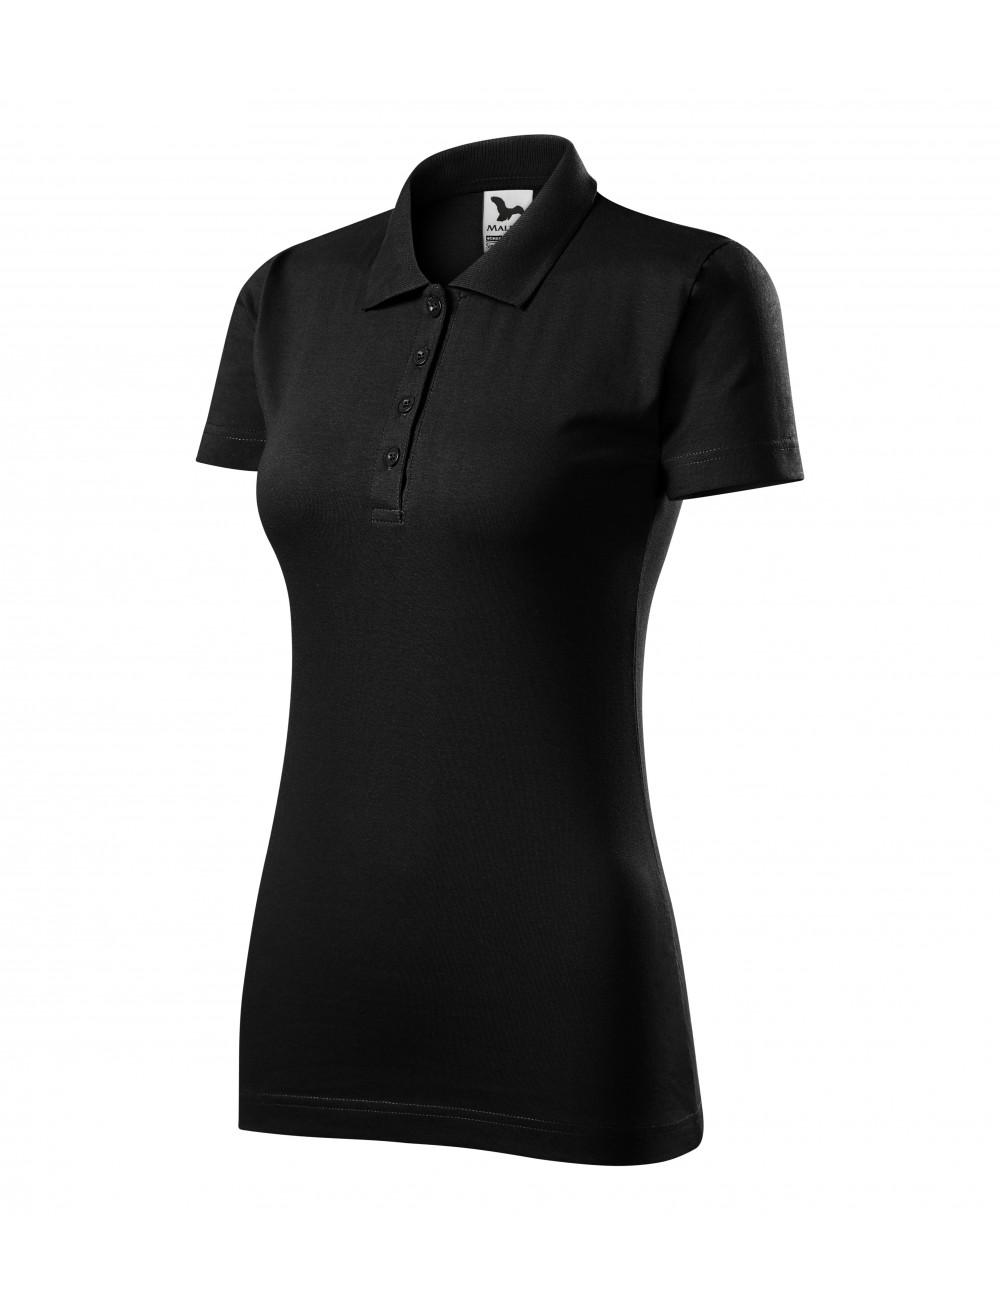 Adler MALFINI Koszulka polo damska Single J. 223 czarny